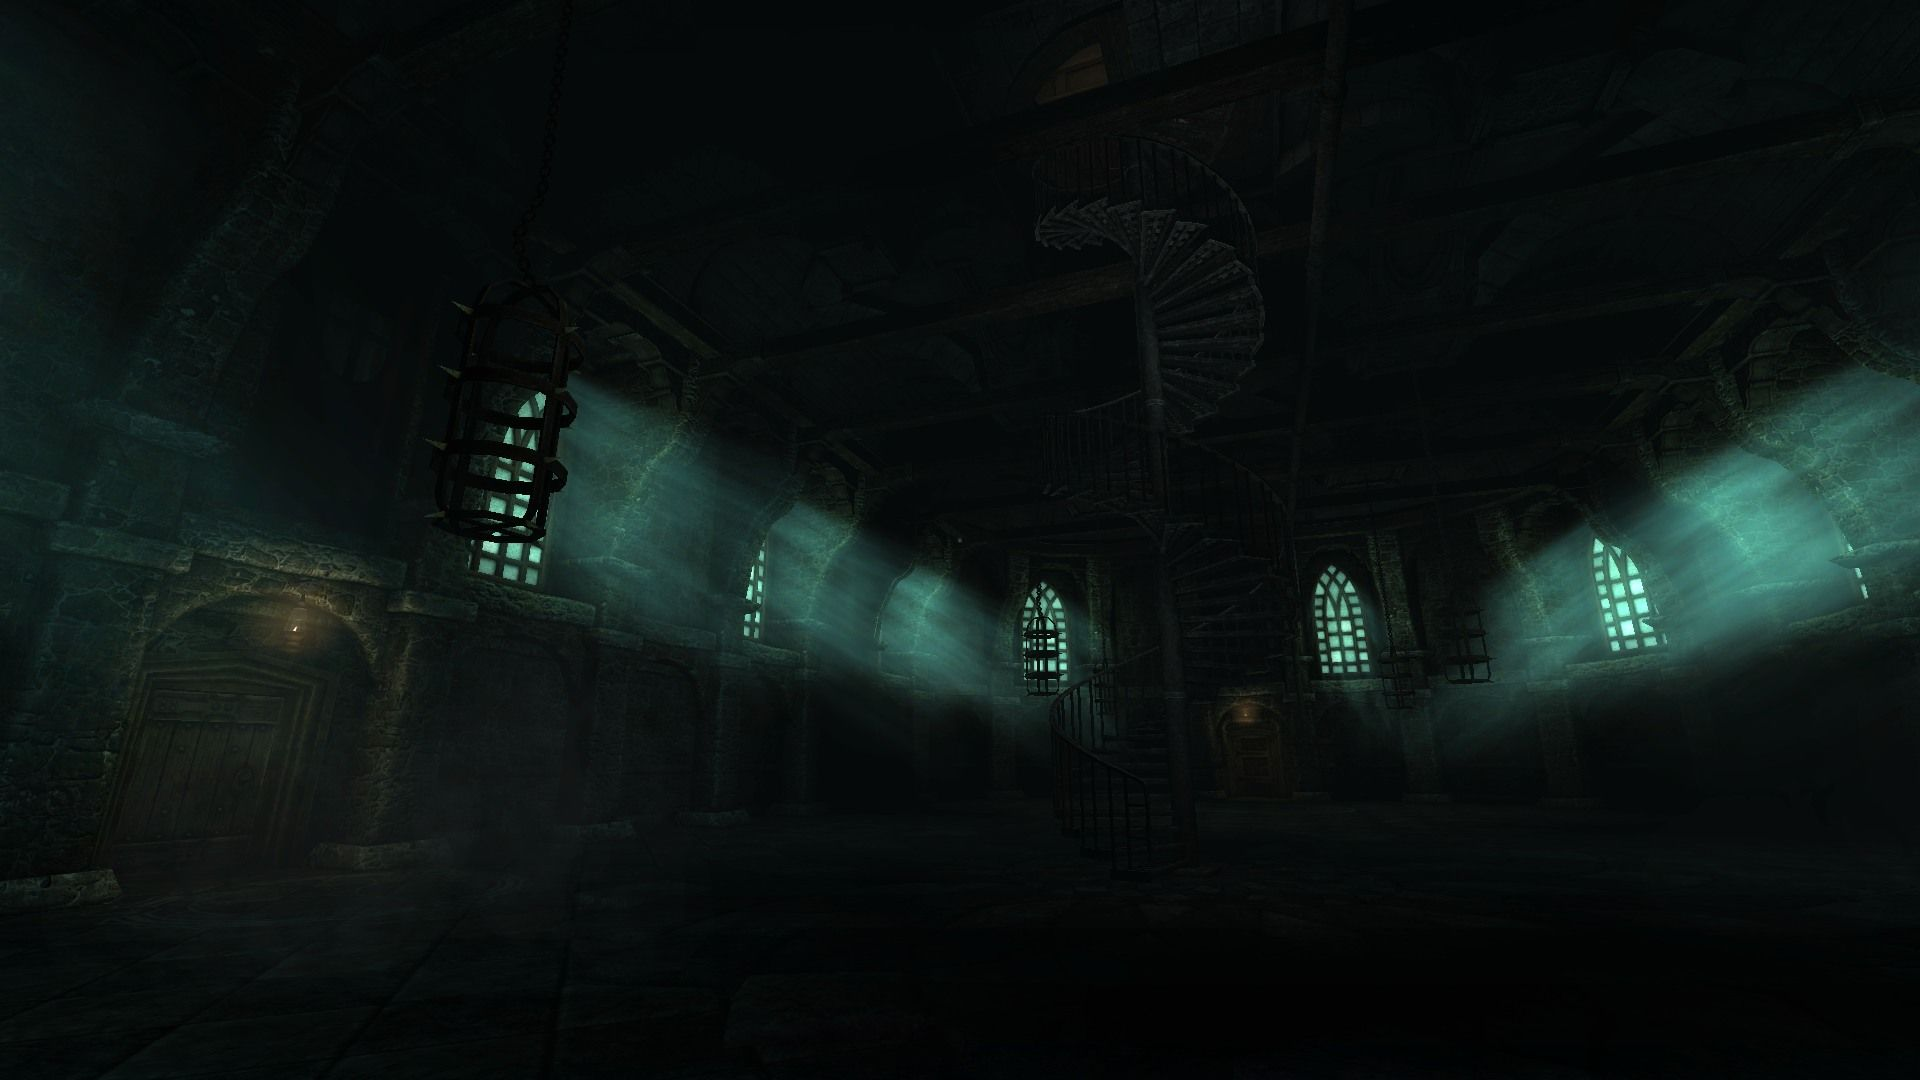 Image 1 Amnesia Troubled Past Mod For Amnesia The Dark Descent